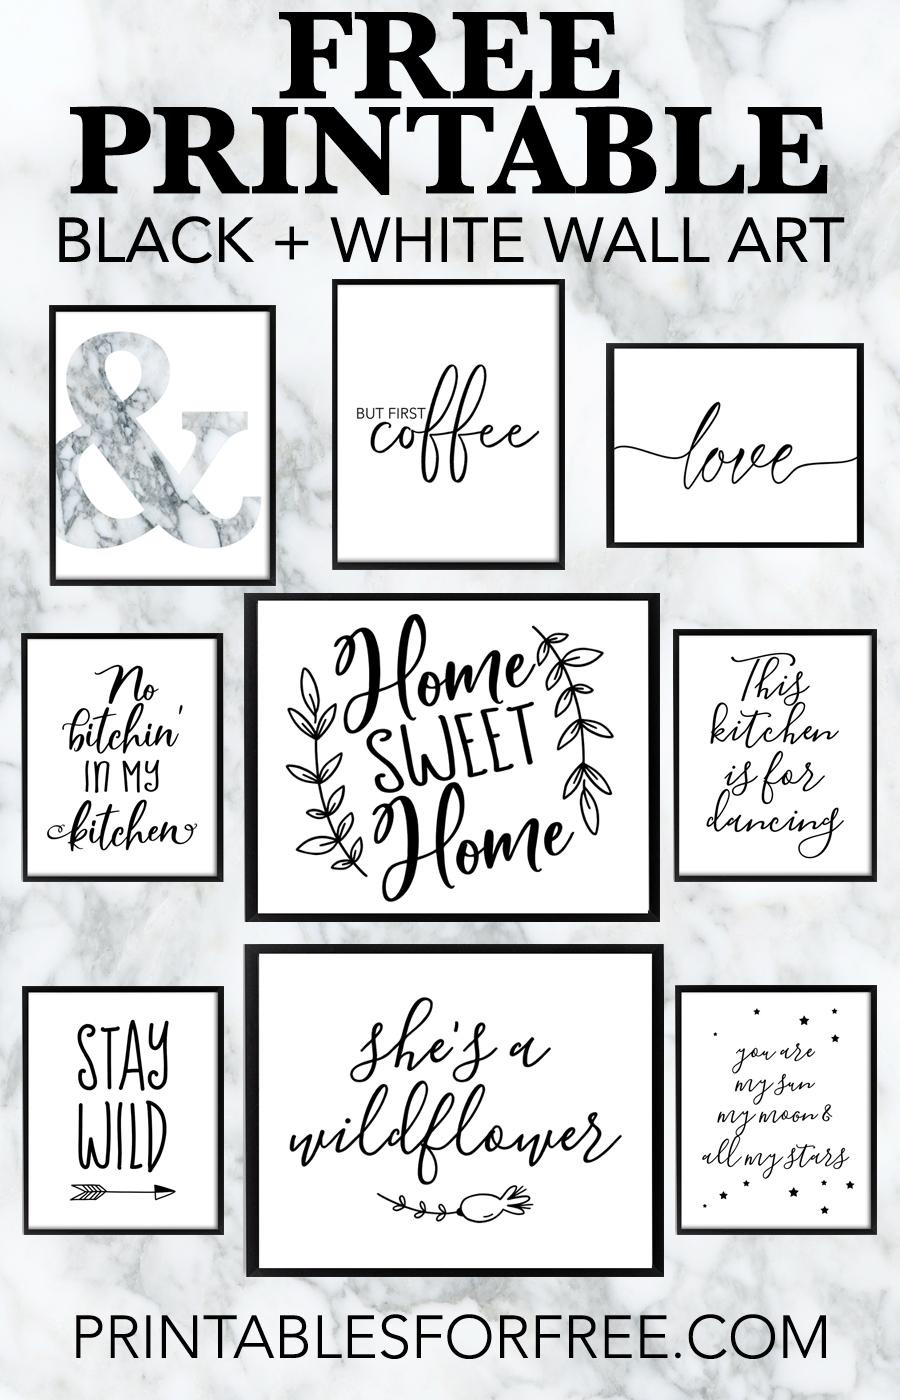 Free Printable Black And White Wall Art - Download And Print Your Ow - Free Printable Wall Art Black And White